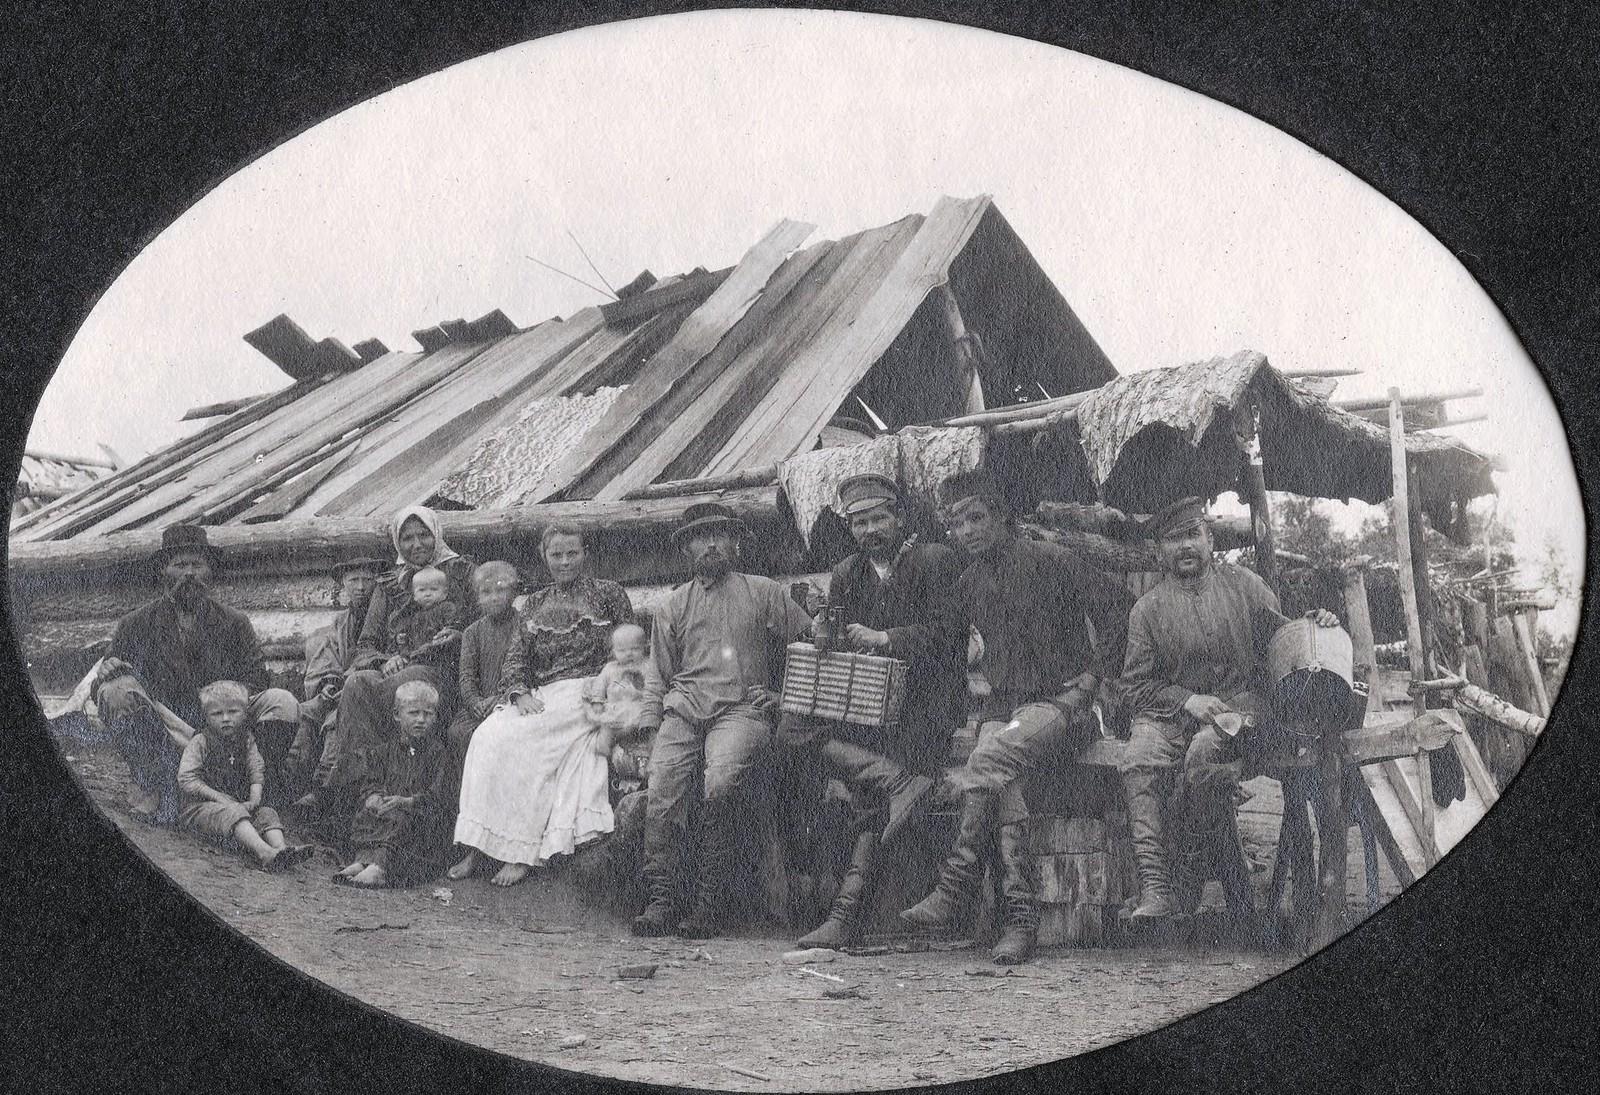 Заимка Куцева. Группа обитателей заимки на фоне барака